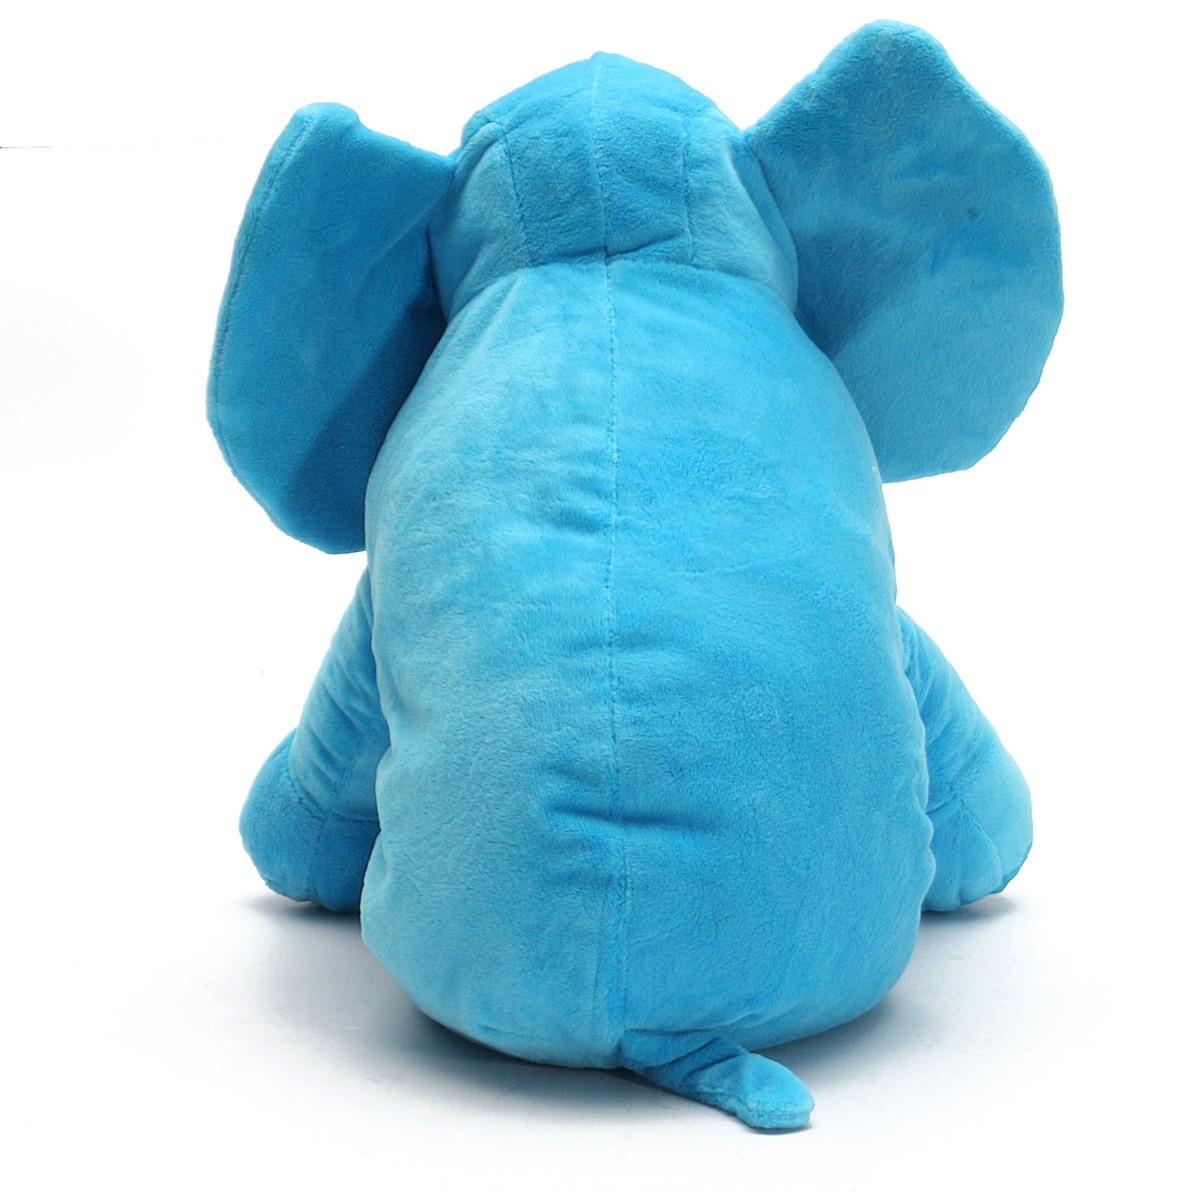 Baby Kids Plush Elephant Sleep Pillow Infant Soft For Sleeping ...